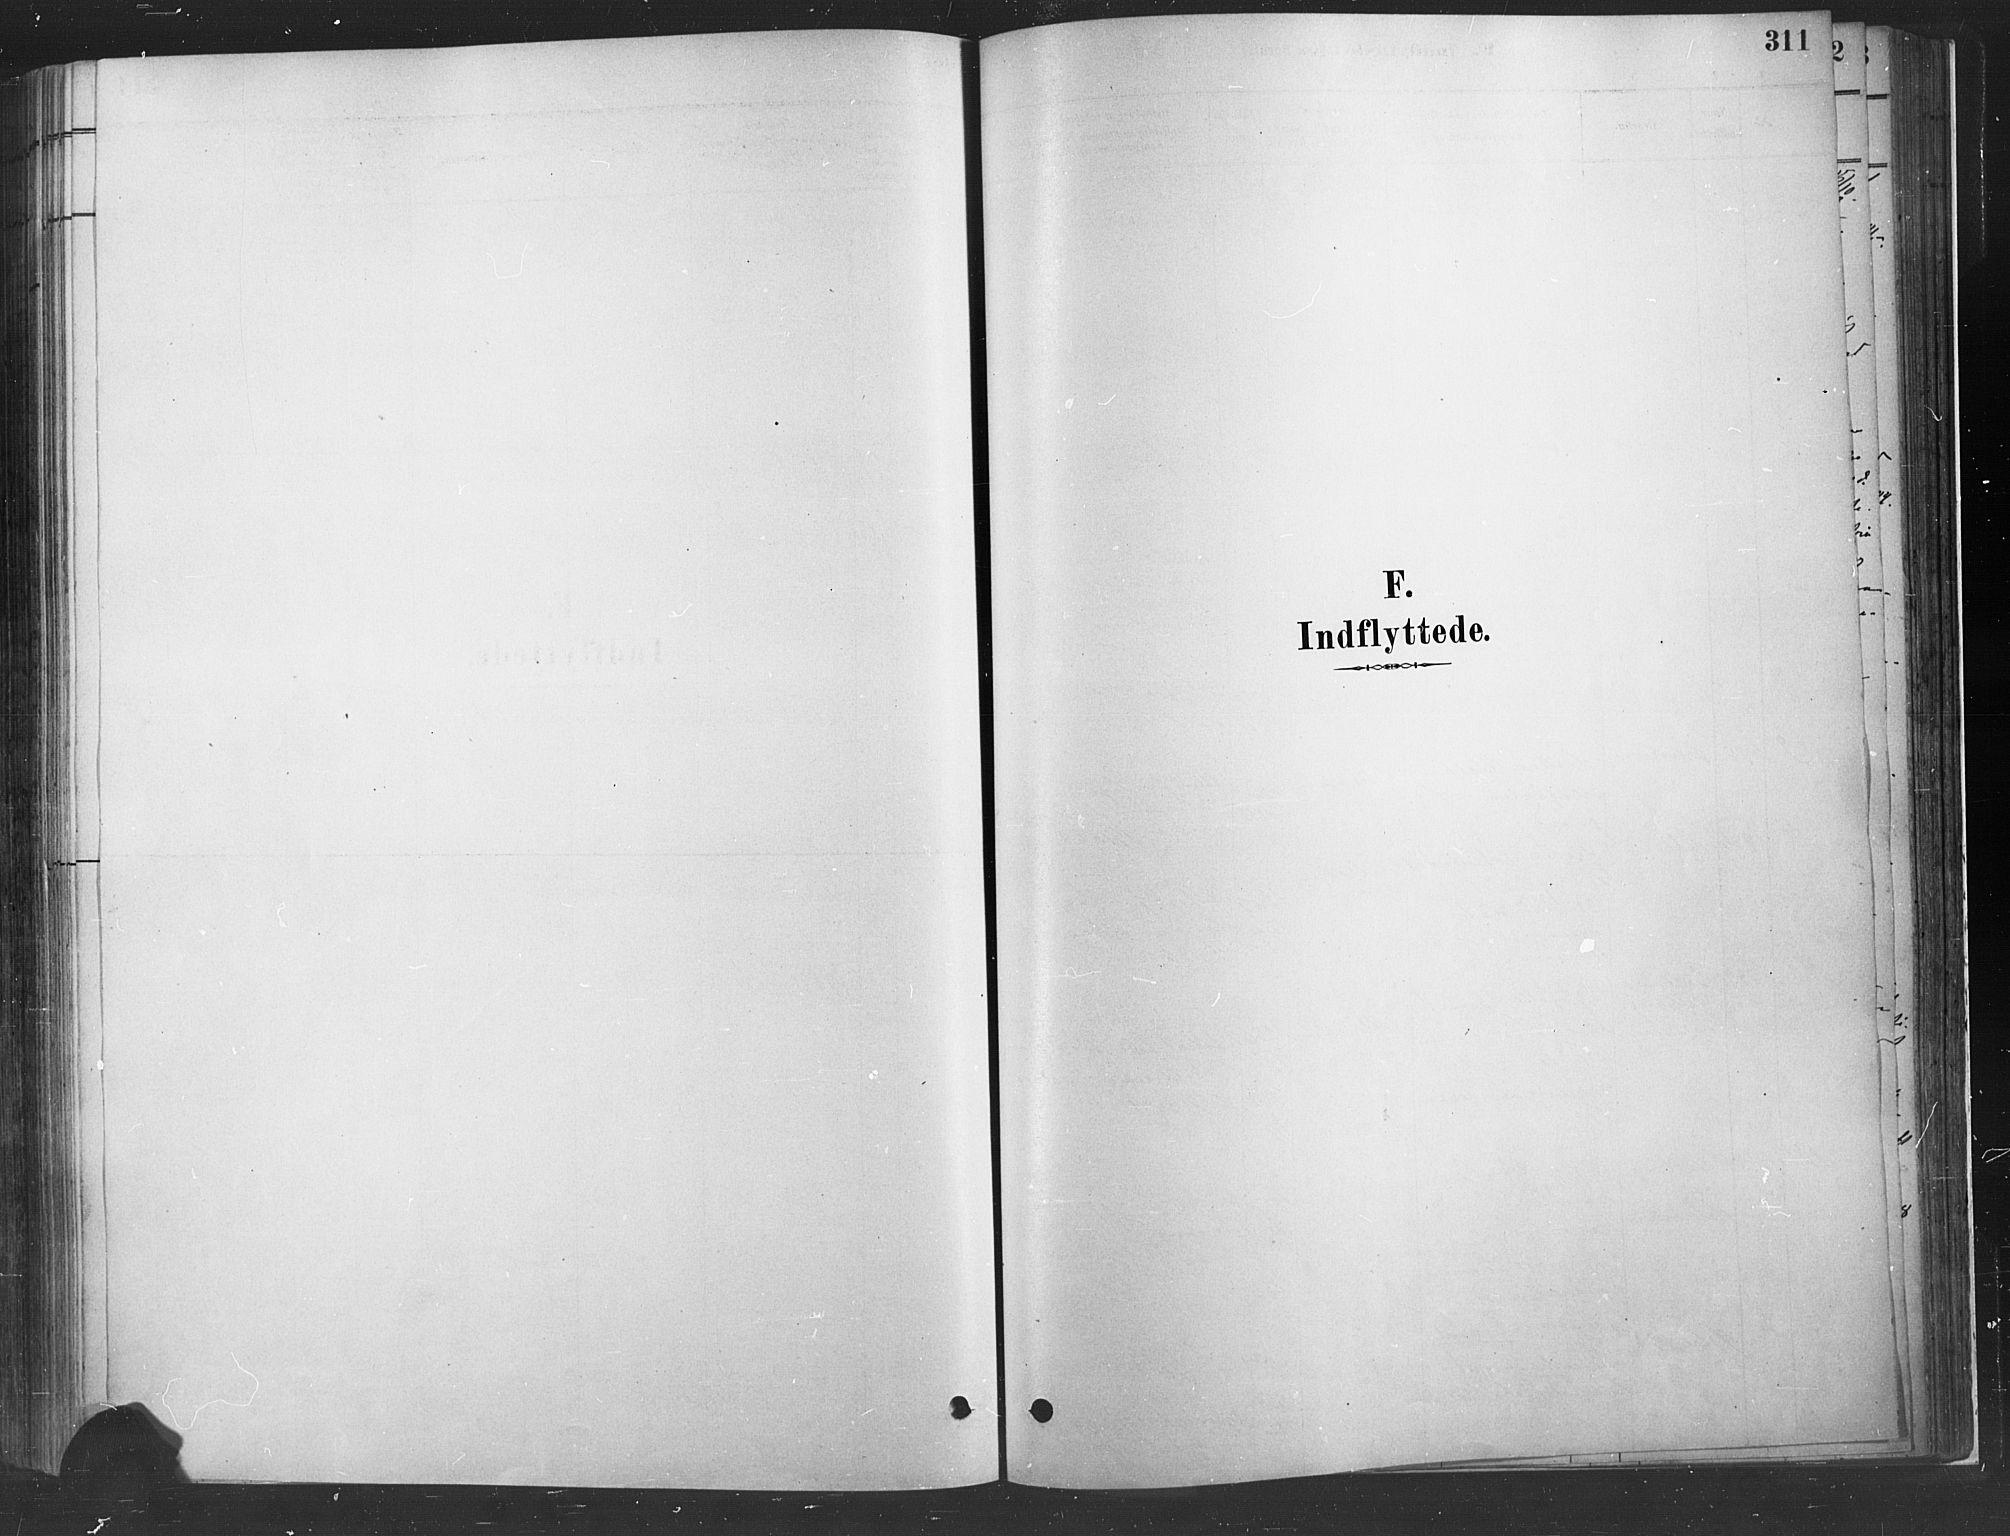 SAH, Fåberg prestekontor, Ministerialbok nr. 10, 1879-1900, s. 311